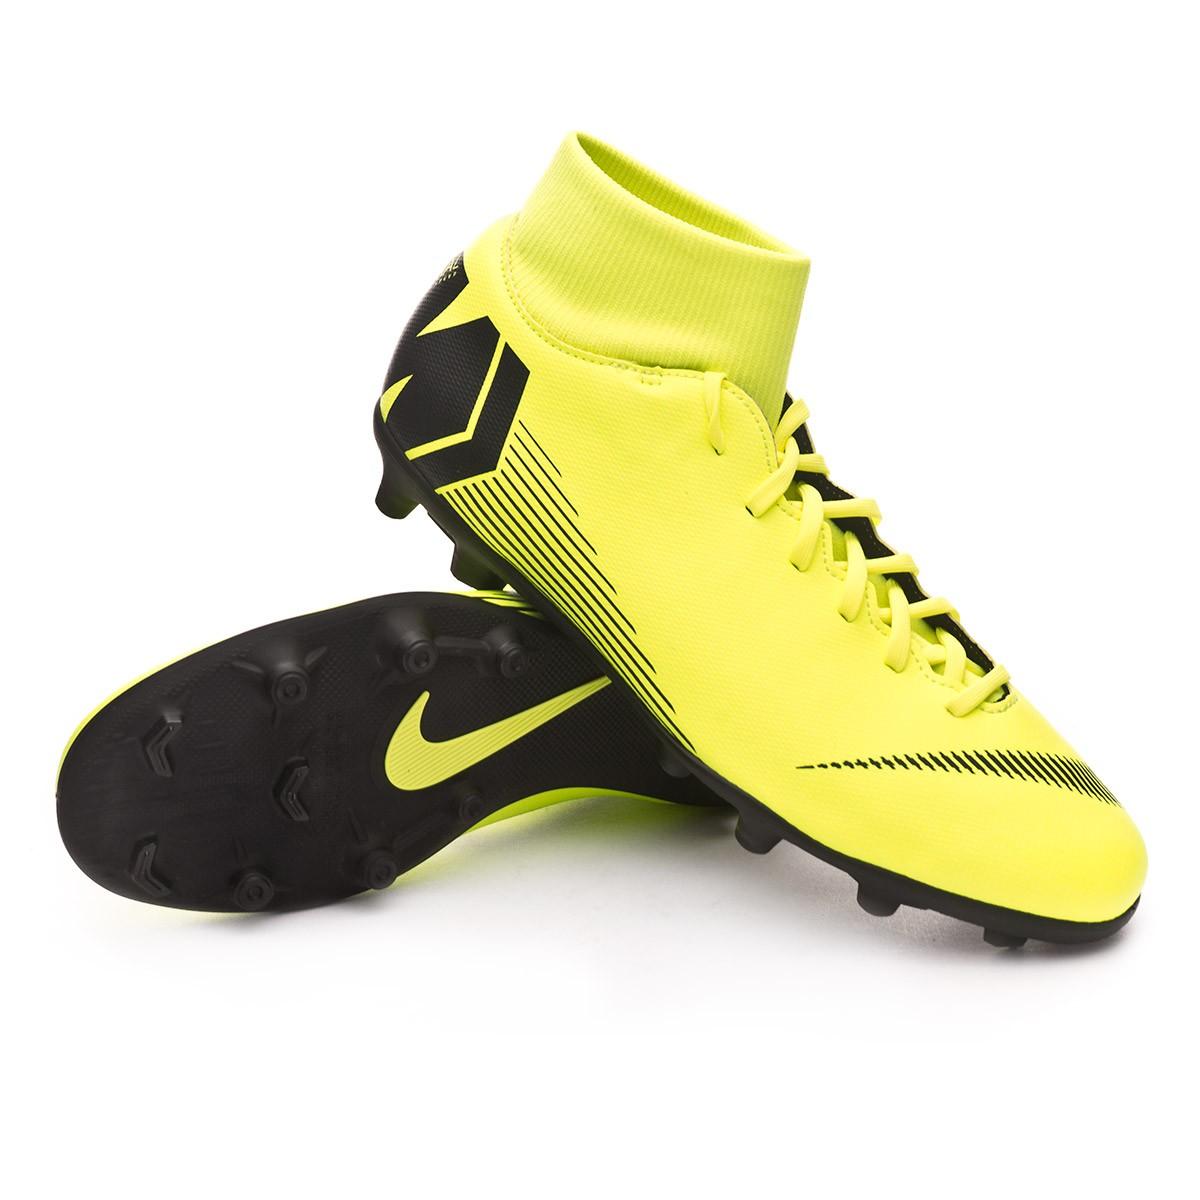 Football Boots Nike Mercurial Superfly VI Club MG Volt-Black ...